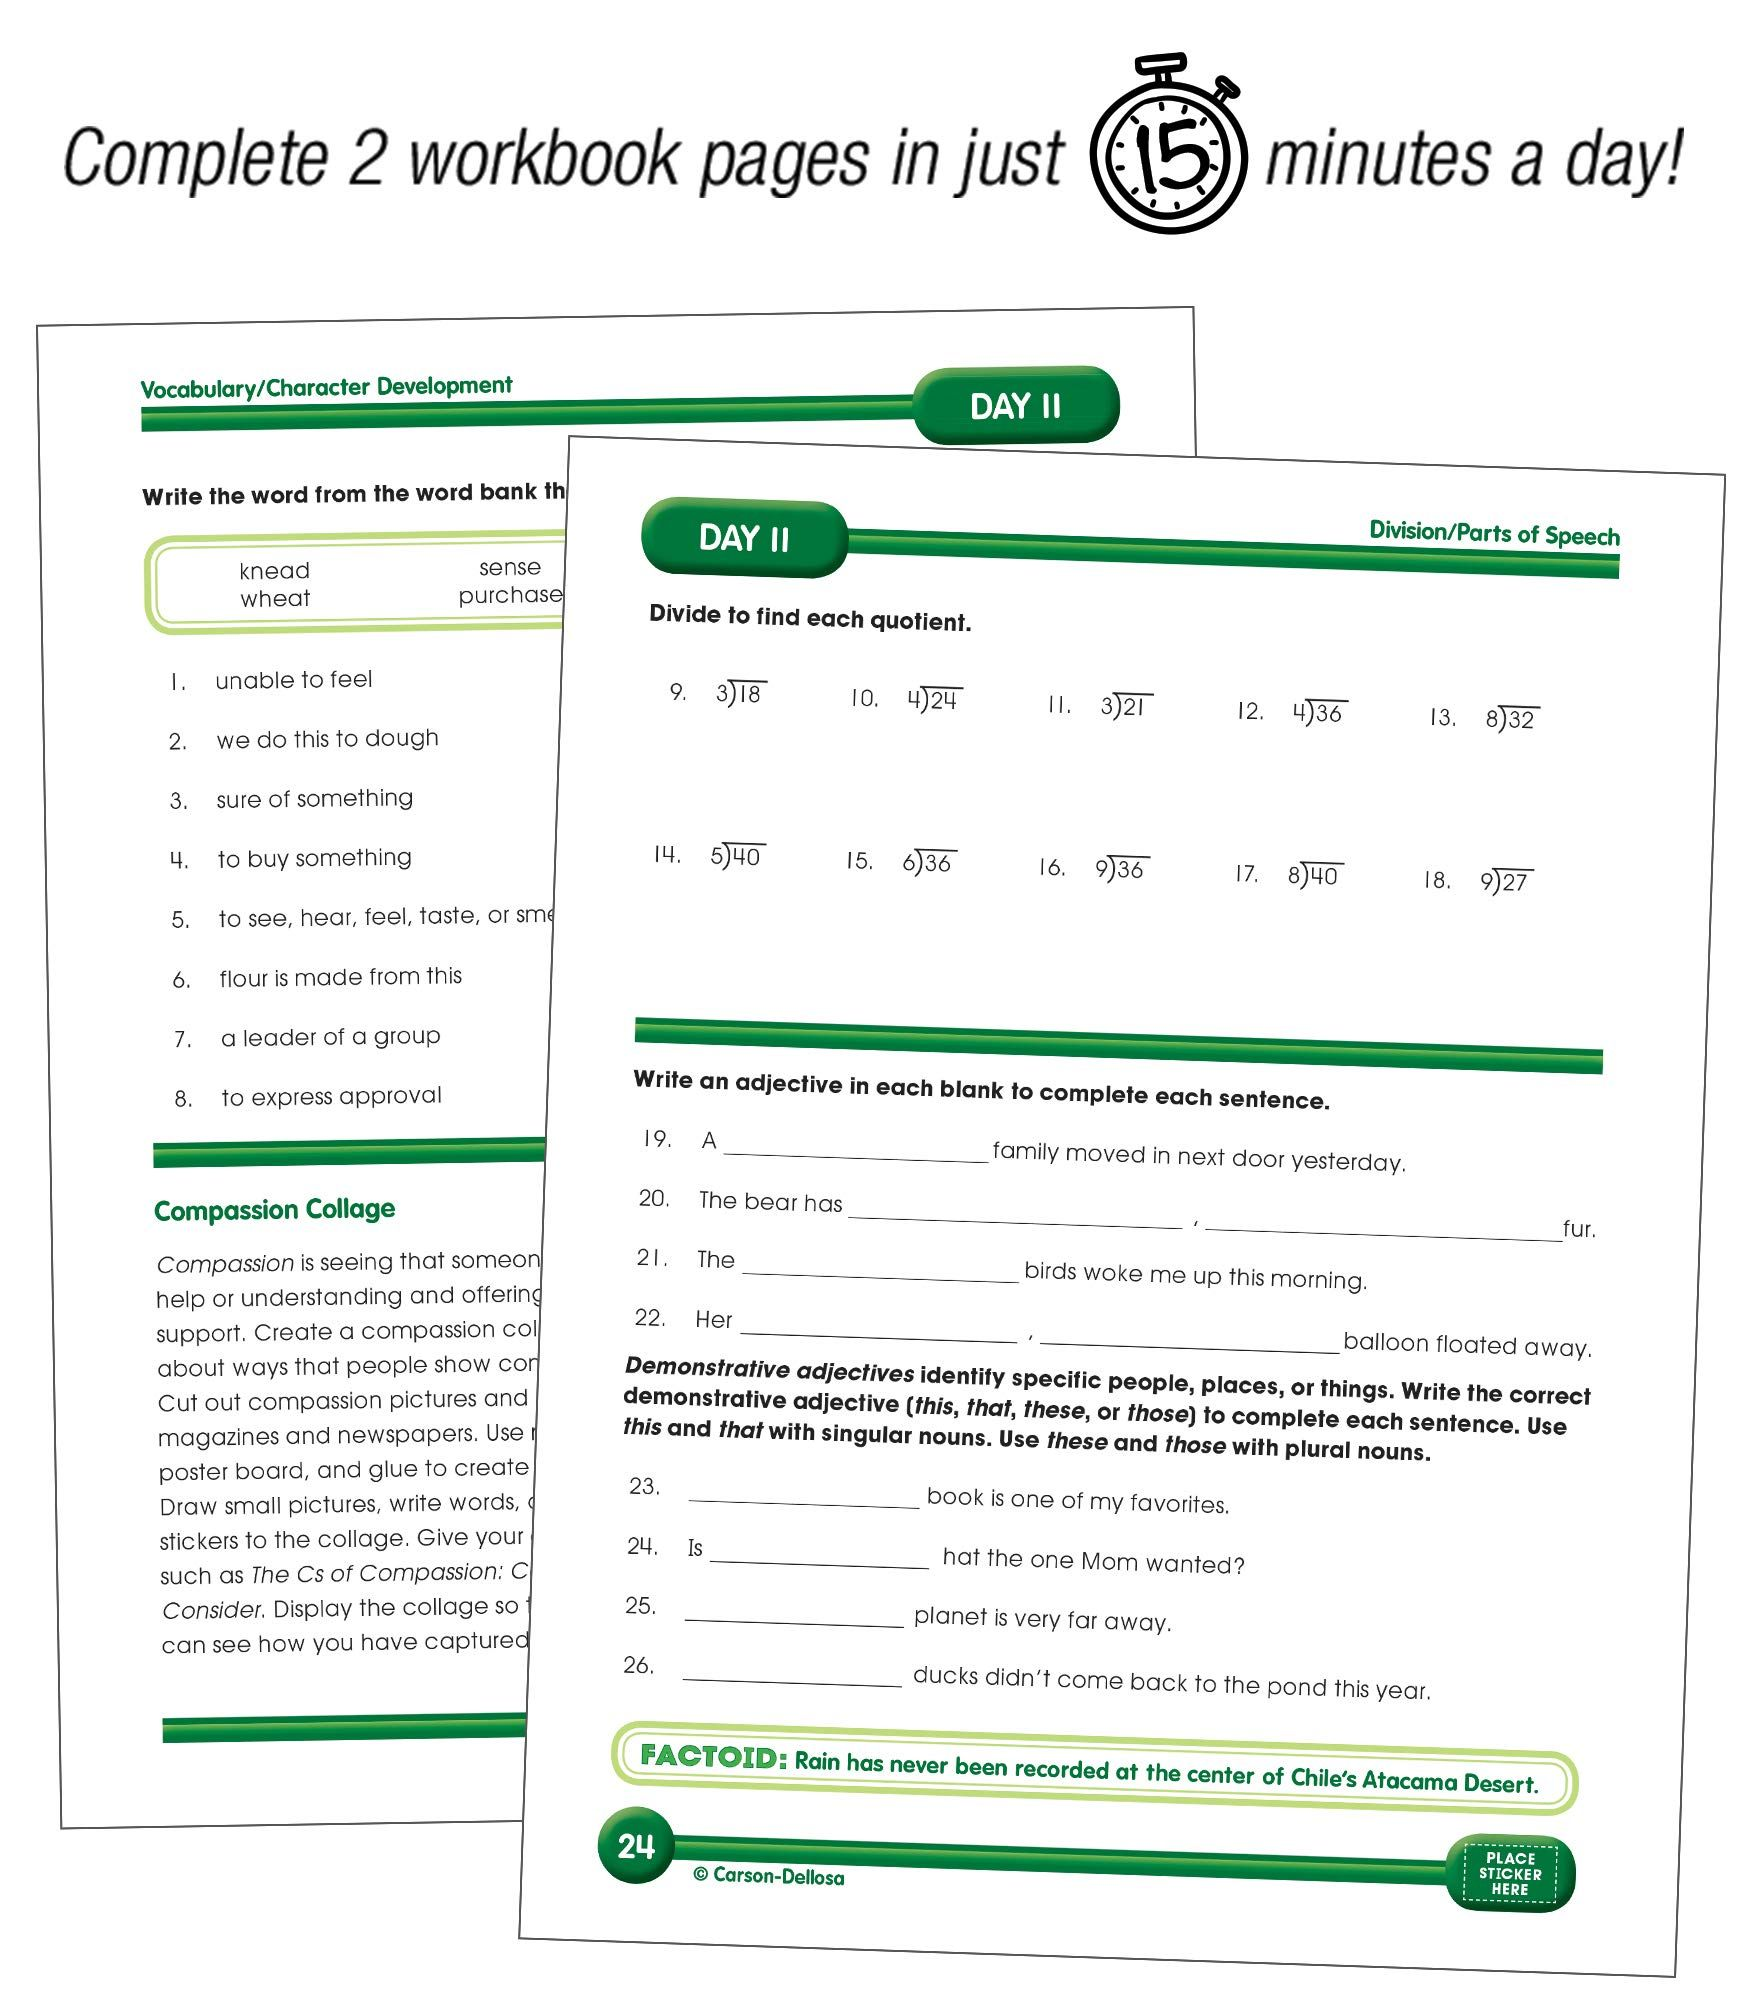 13 Worksheets 3rd Grade Spelling Words List 17 Of 36